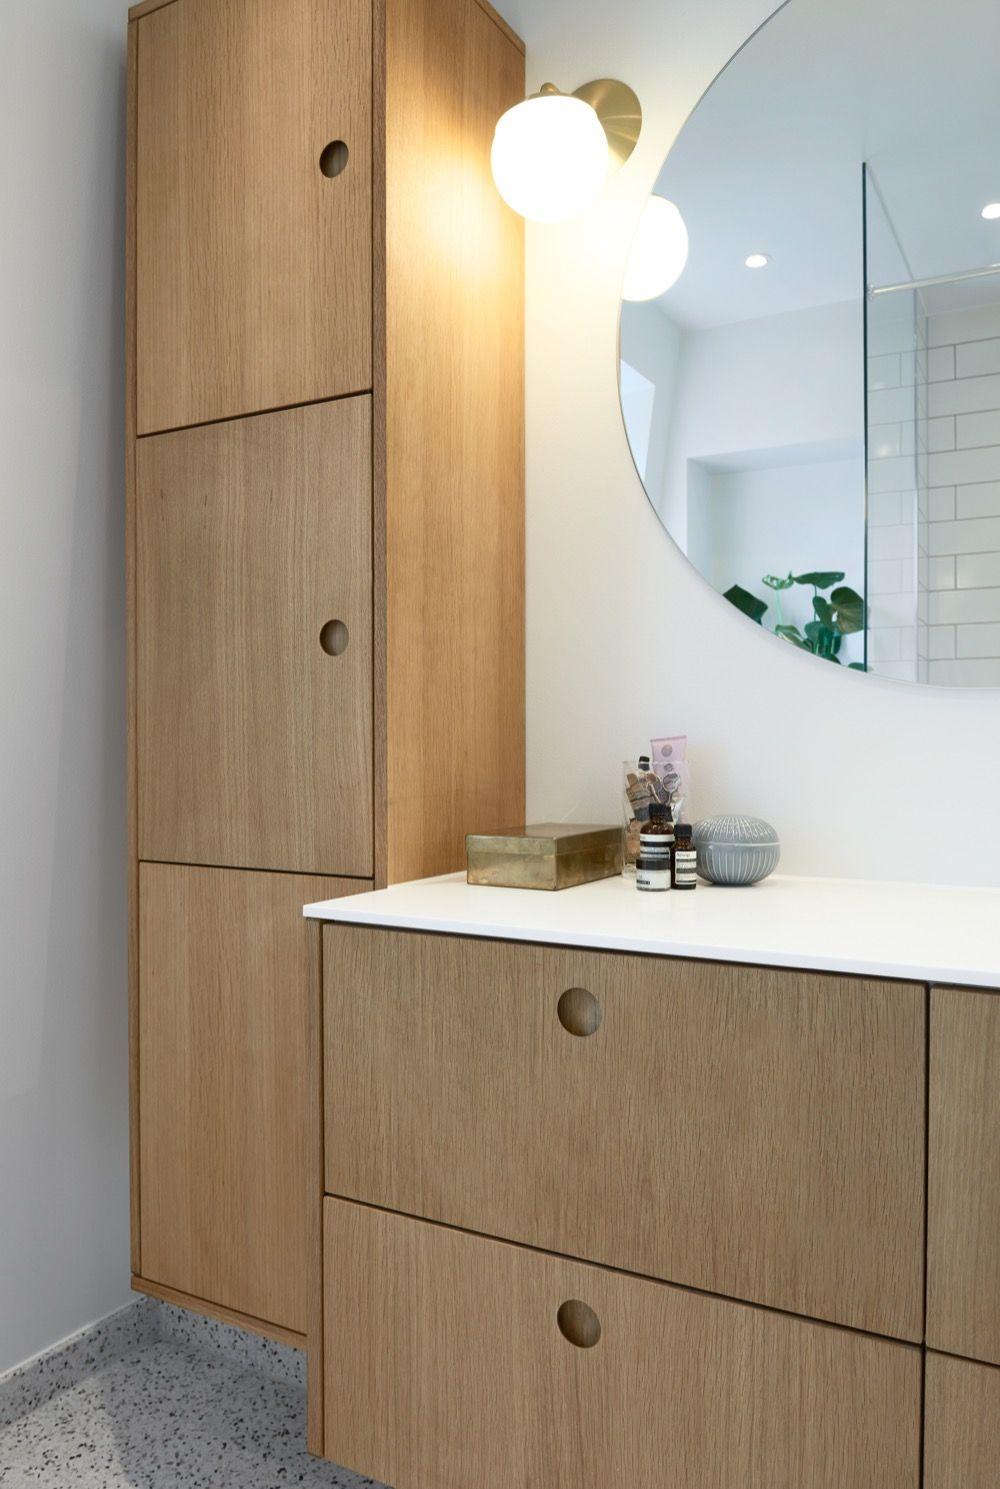 Reform Inspiration Limfjordsvej In Vanlose Danemark In 2020 Ikea Badezimmer Bad Styling Badezimmer Dekor